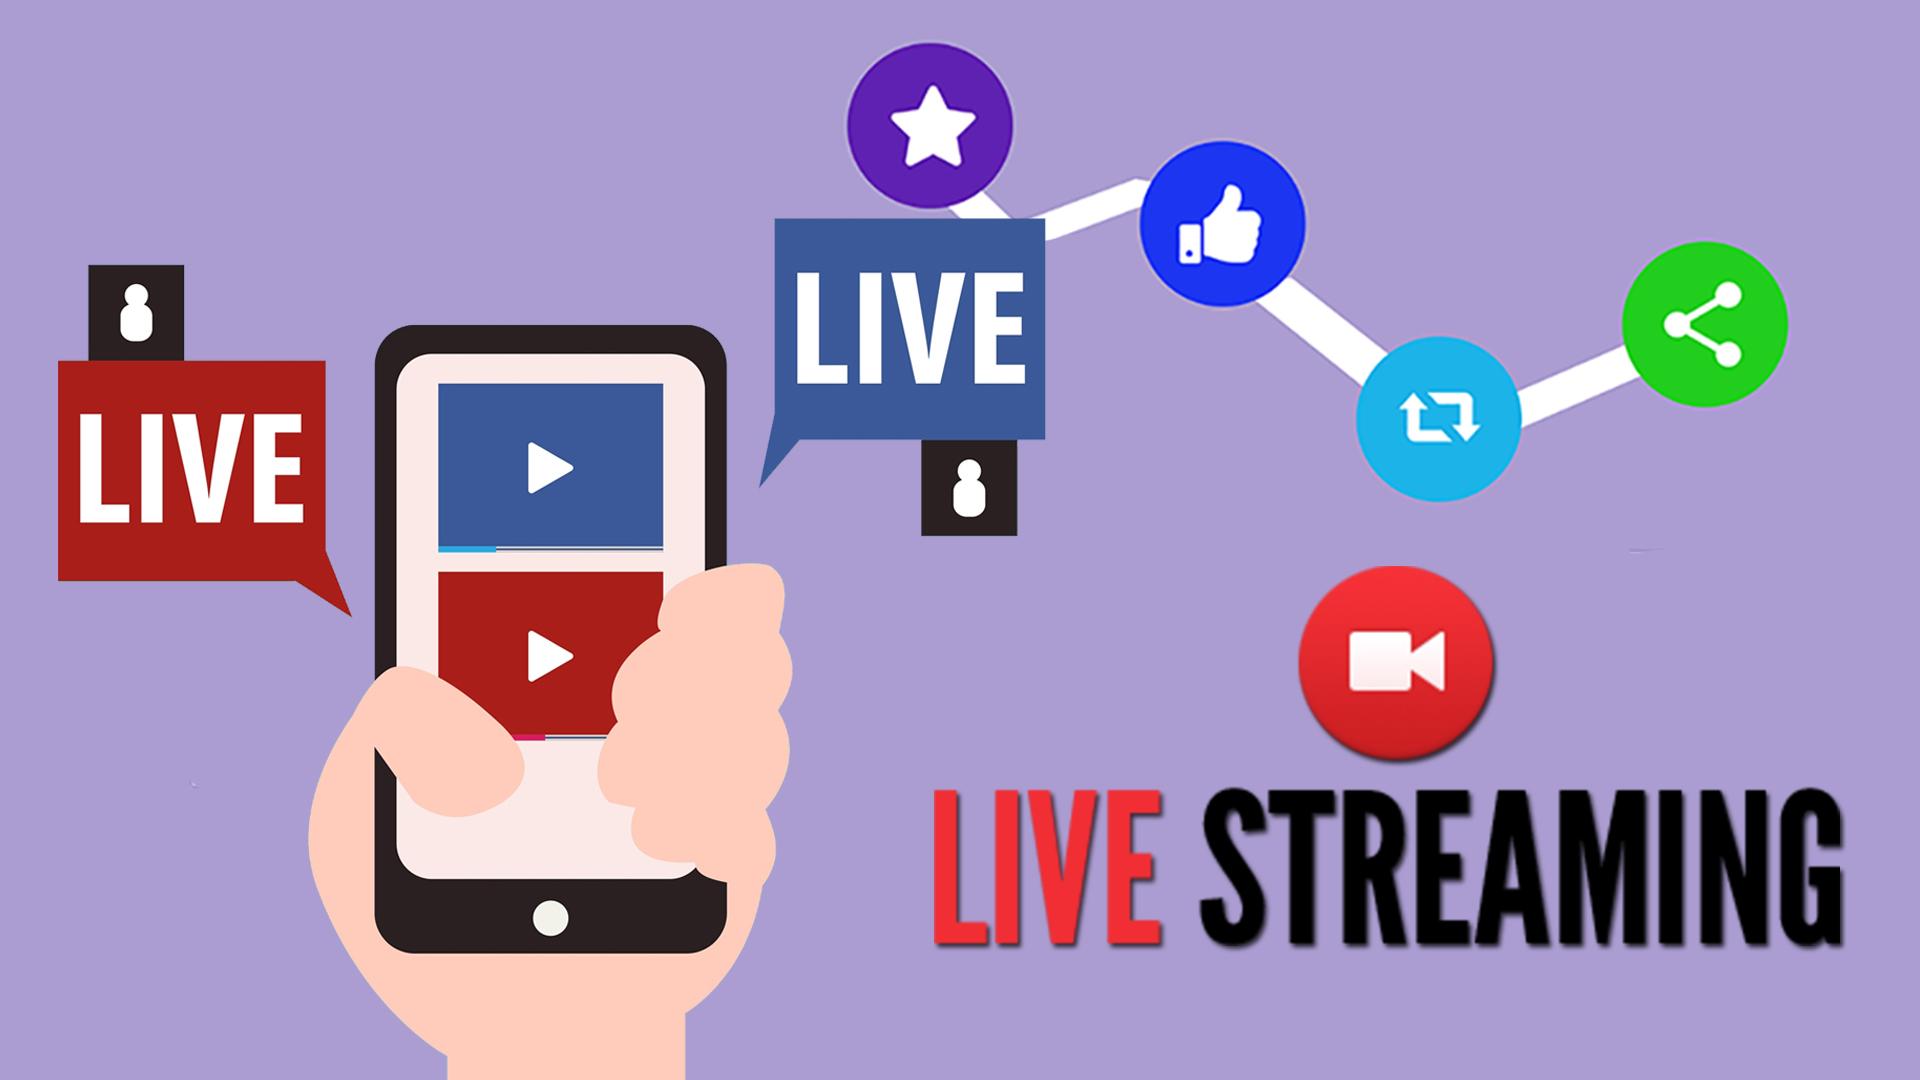 Live Stream เป็นอีกหนึ่งช่องทางที่นักการตลาดไม่ควรมองข้าม